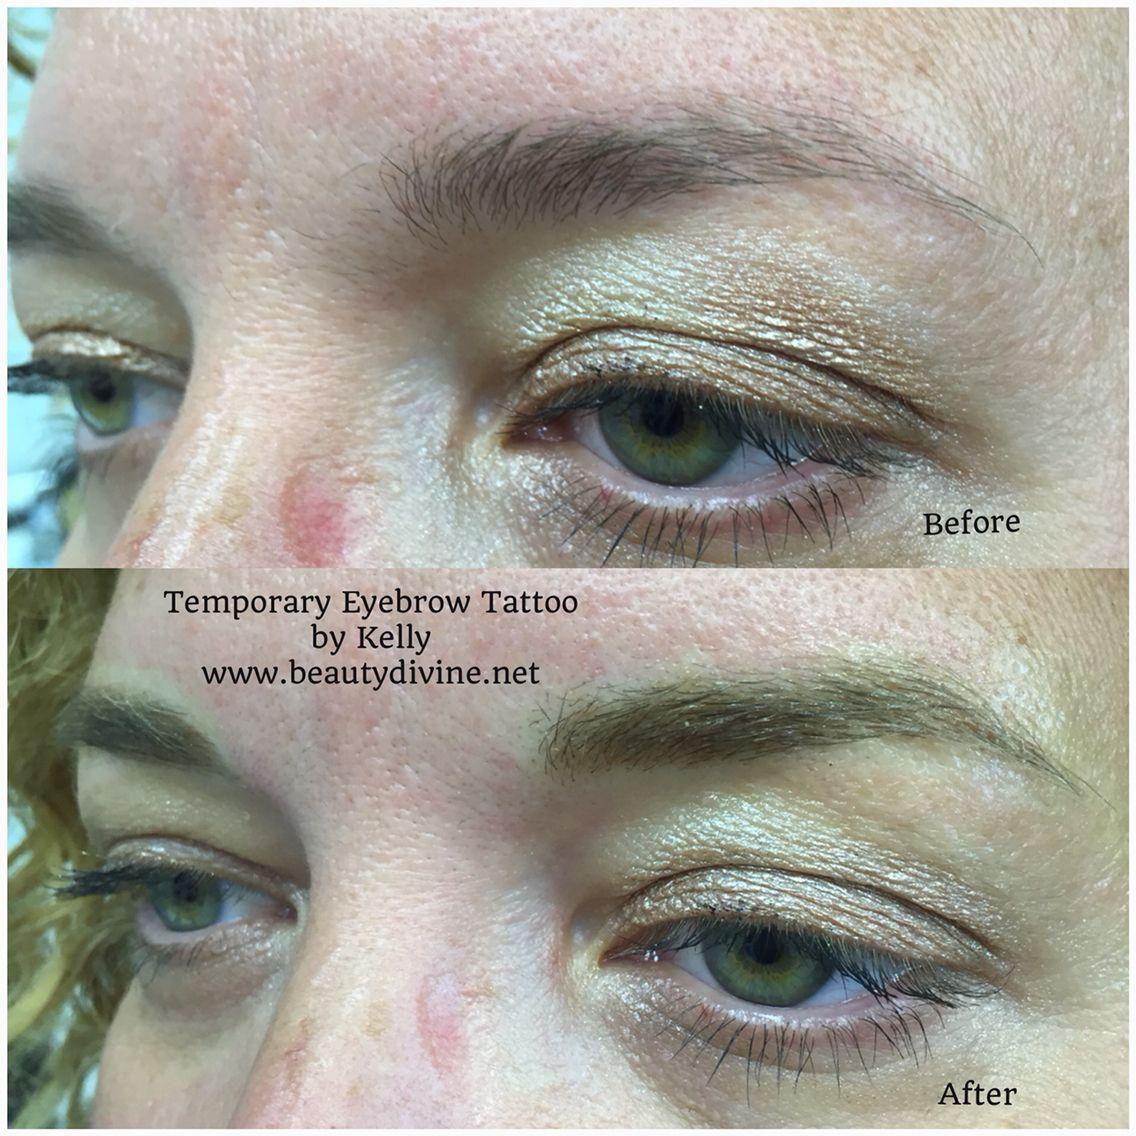 Temporary eyebrow tattoo, permanent makeup, microblading | Temporary ...